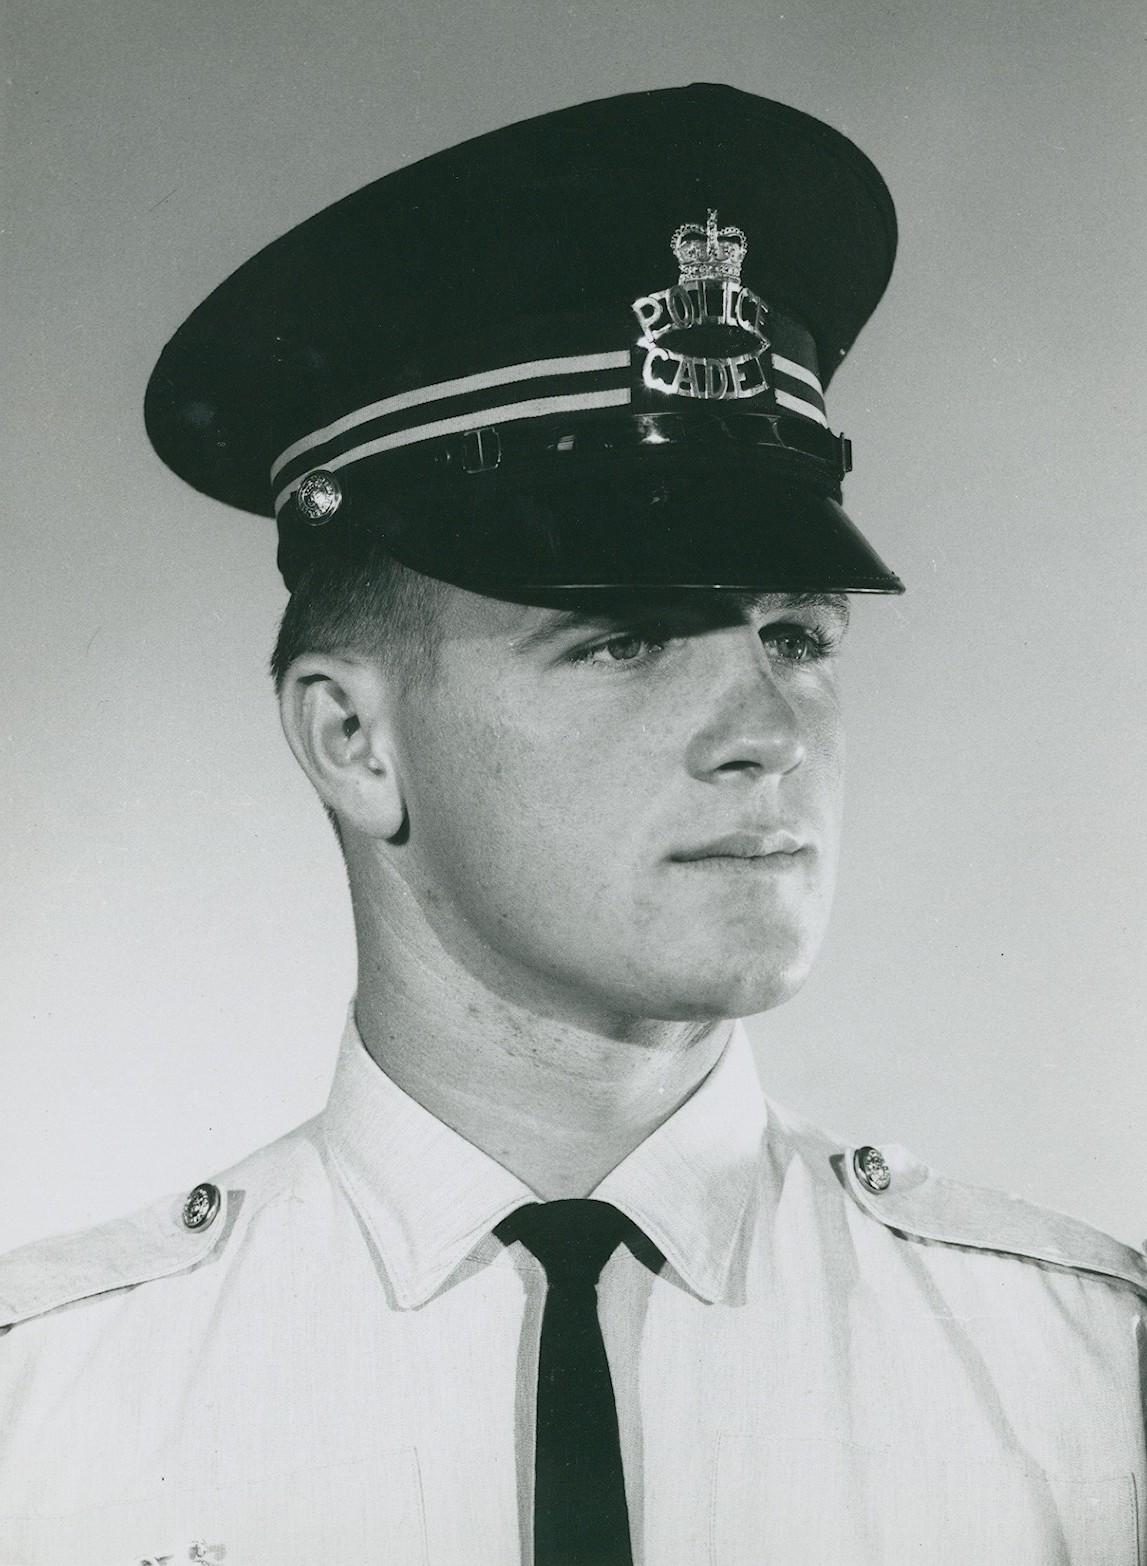 Myron KUBYK Cadet 2354